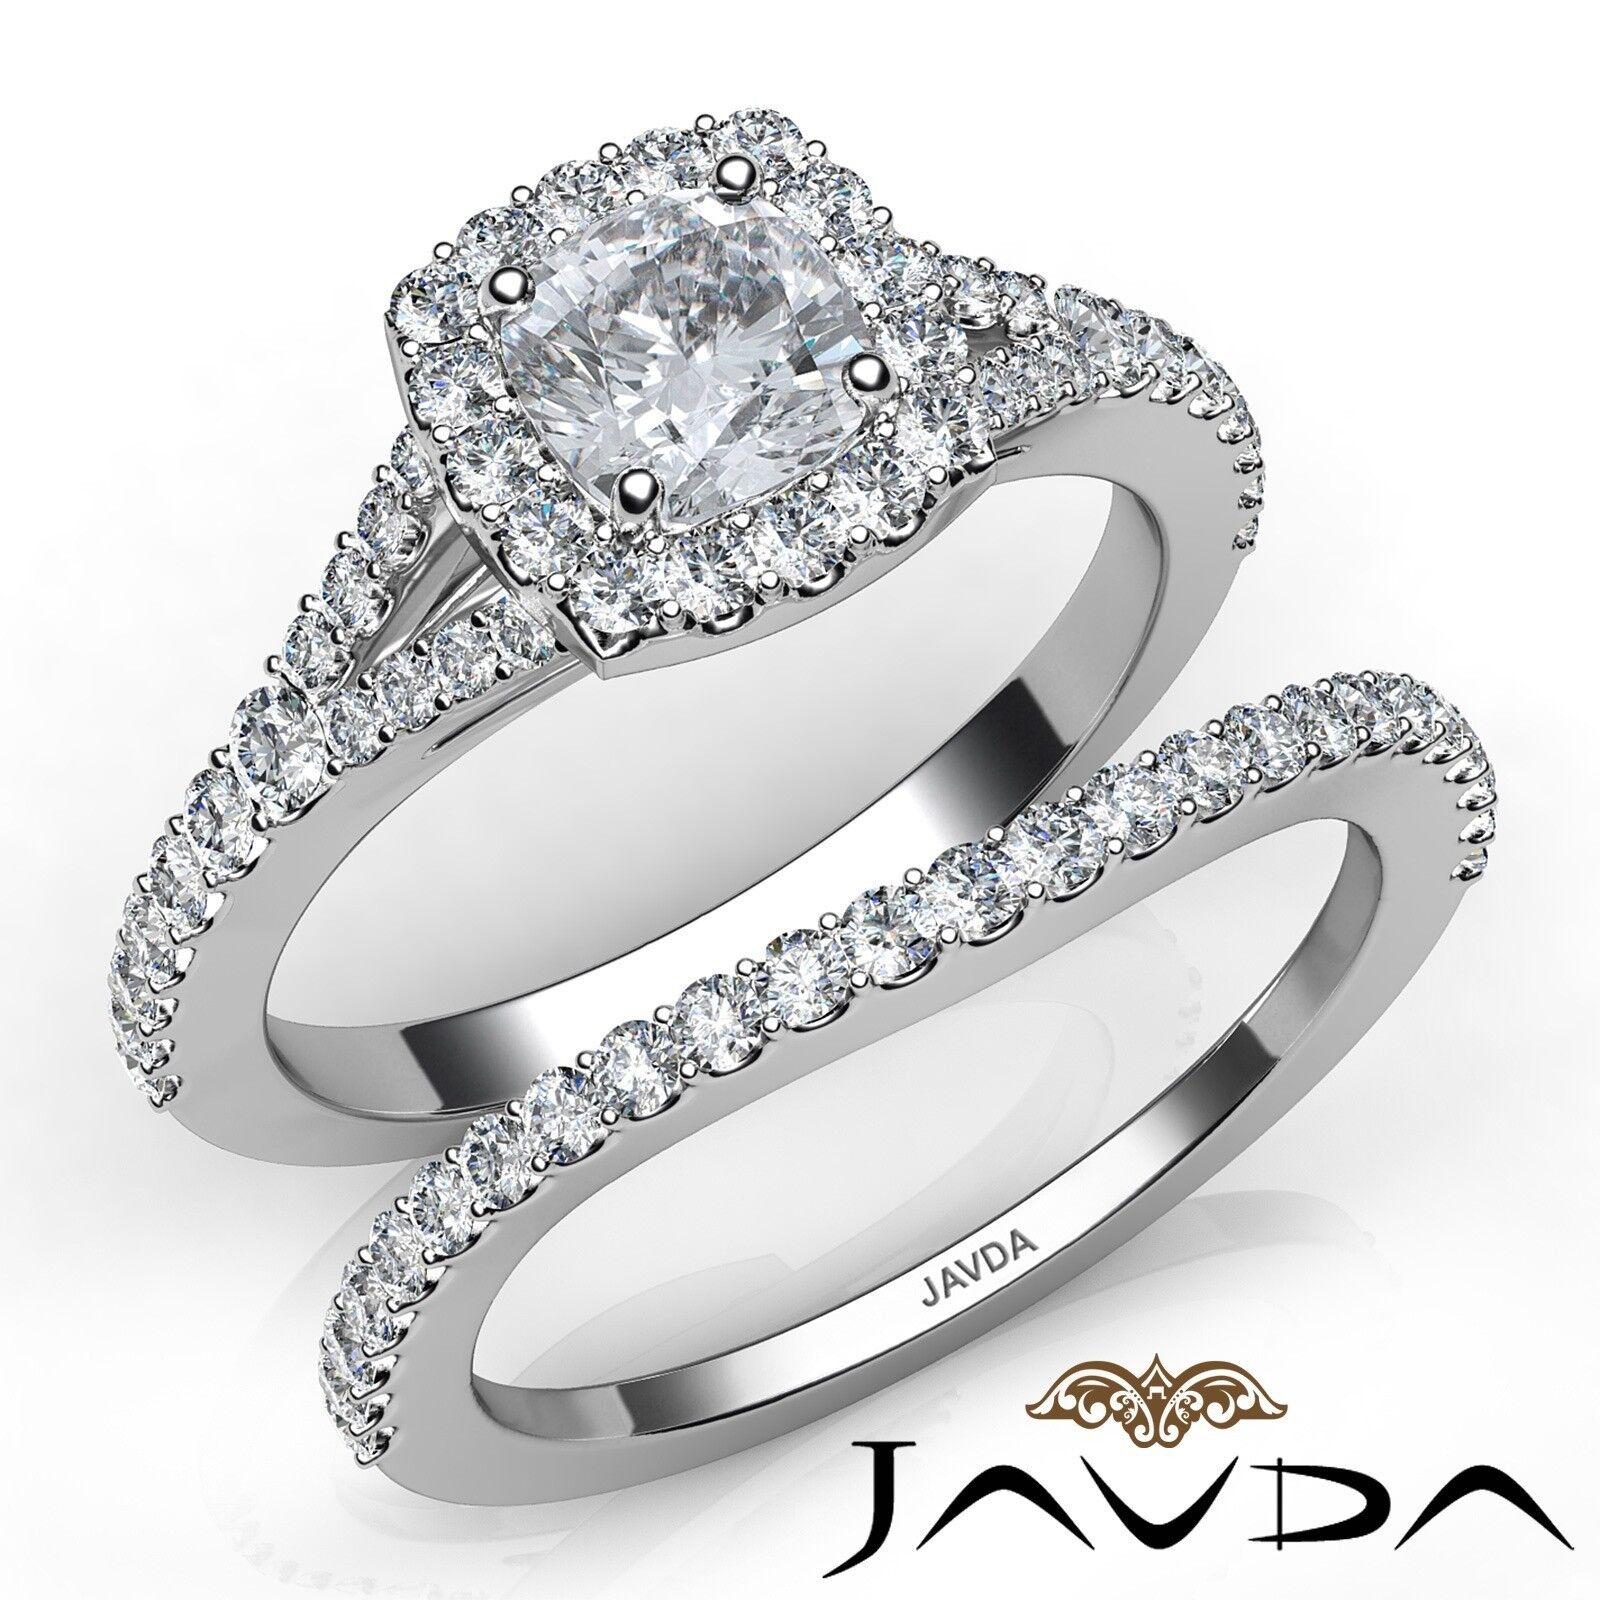 1.8ctw U Cut Pave Halo Bridal Cushion Diamond Engagement Ring GIA E-VS2 W Gold